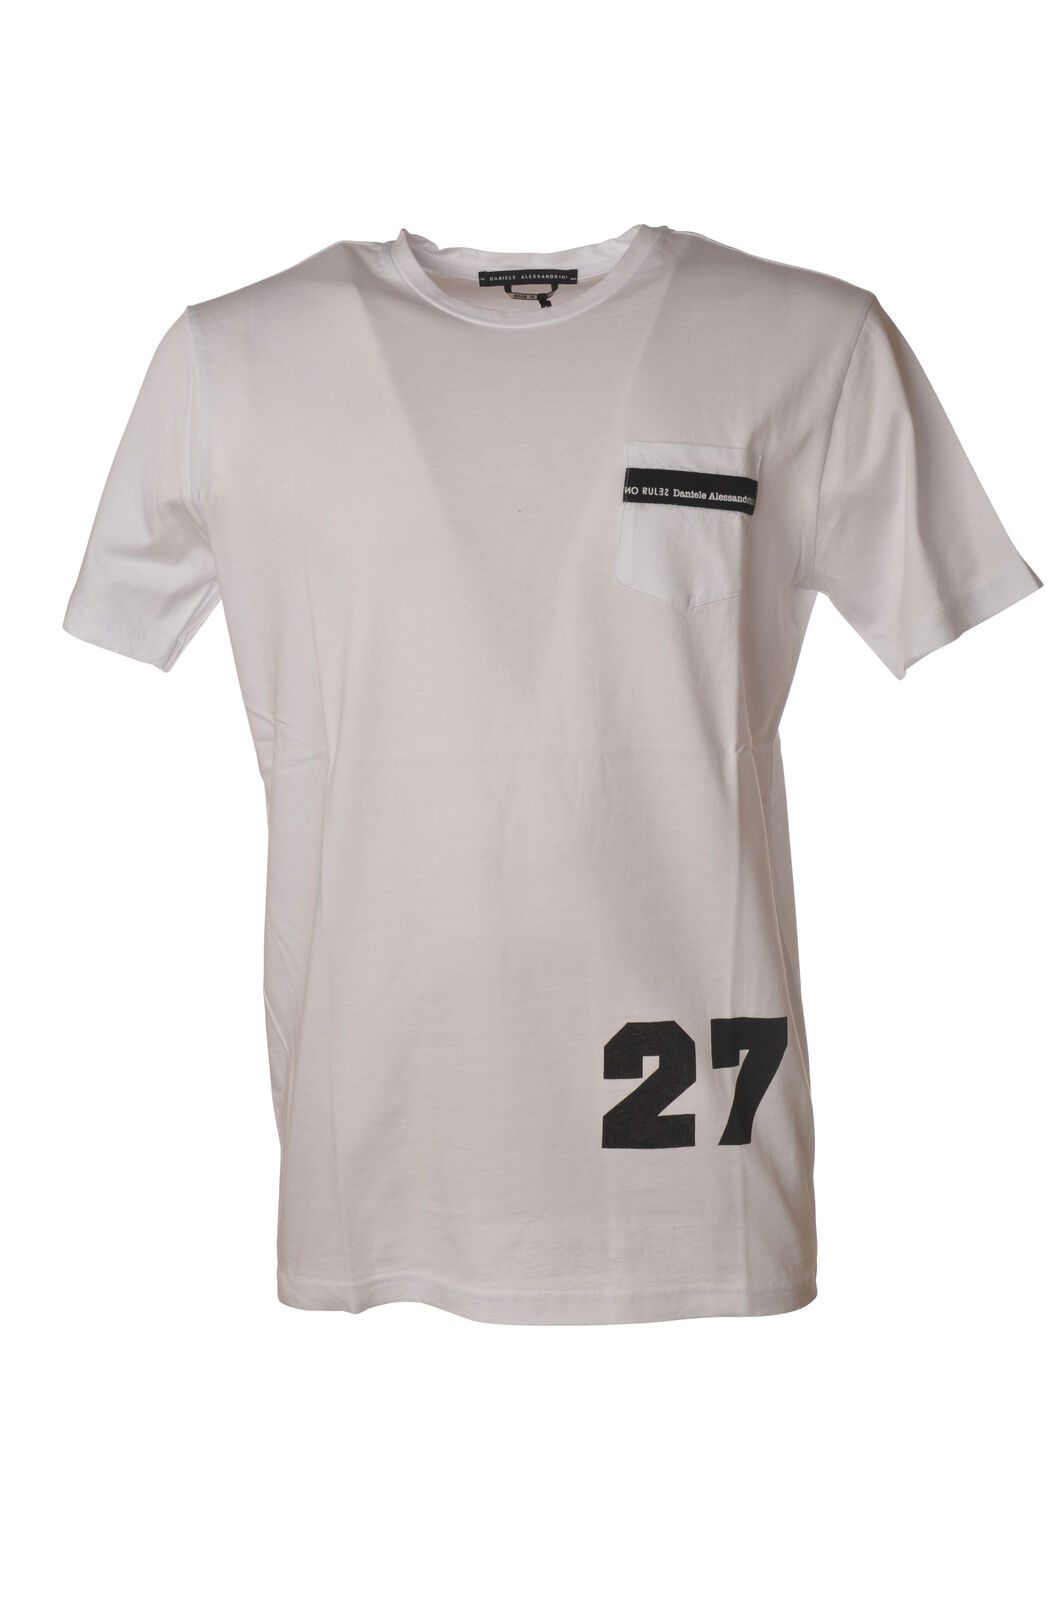 Daniele Alessandrini - Topwear-T-shirts - Uomo - - - Bianco - 5464024N181435 a5cc44